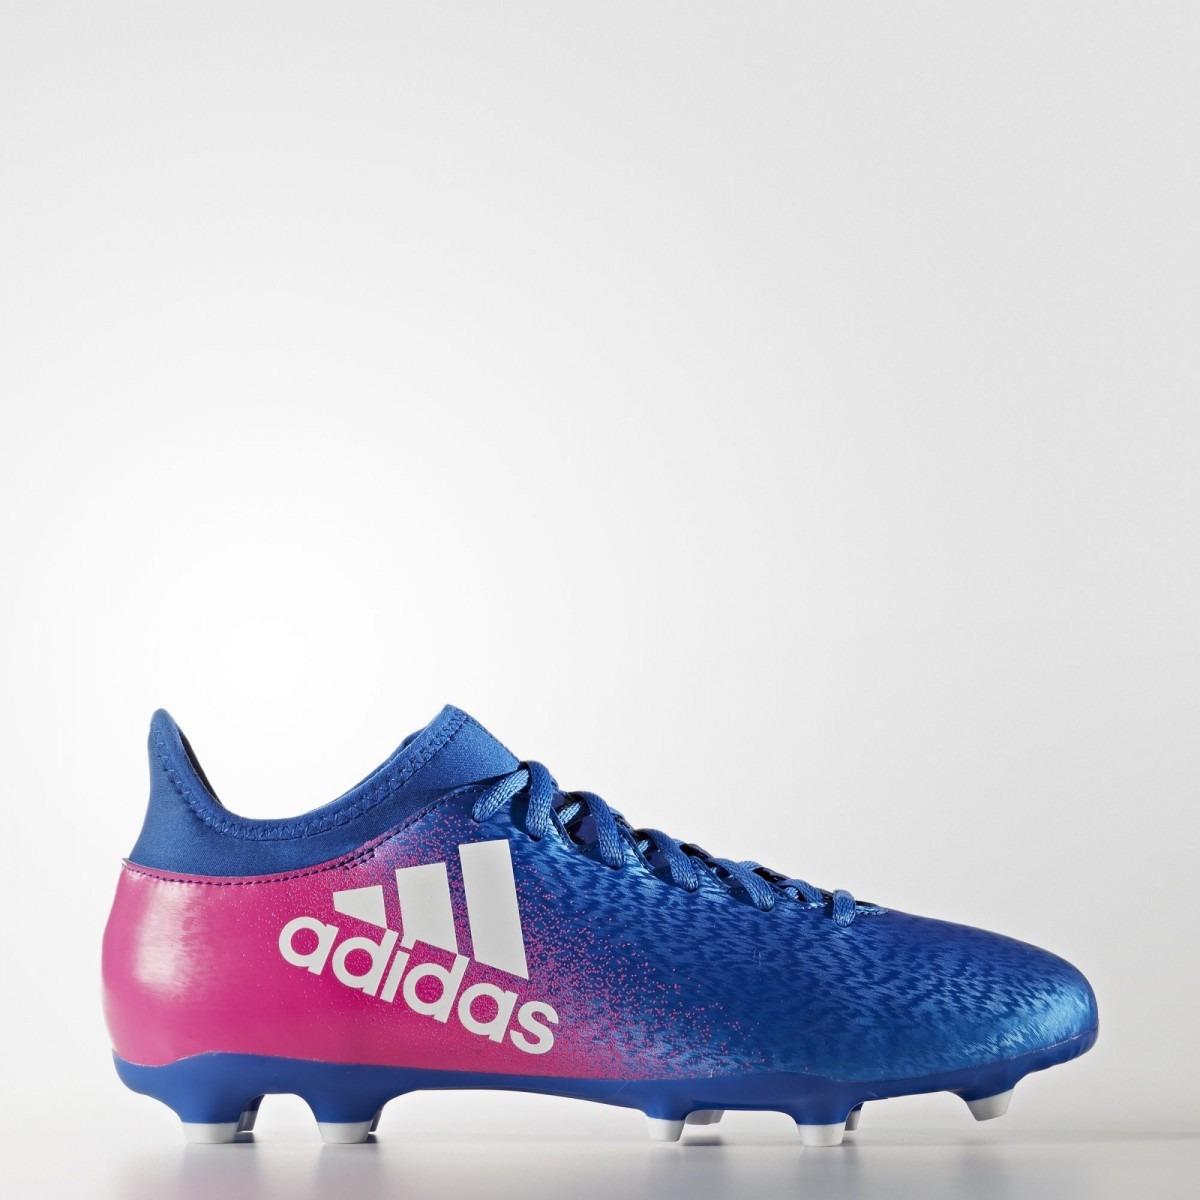 sneakers for cheap 1dc9a d0b44 ... adidas x 16.3 fg bb5641. Carregando zoom.